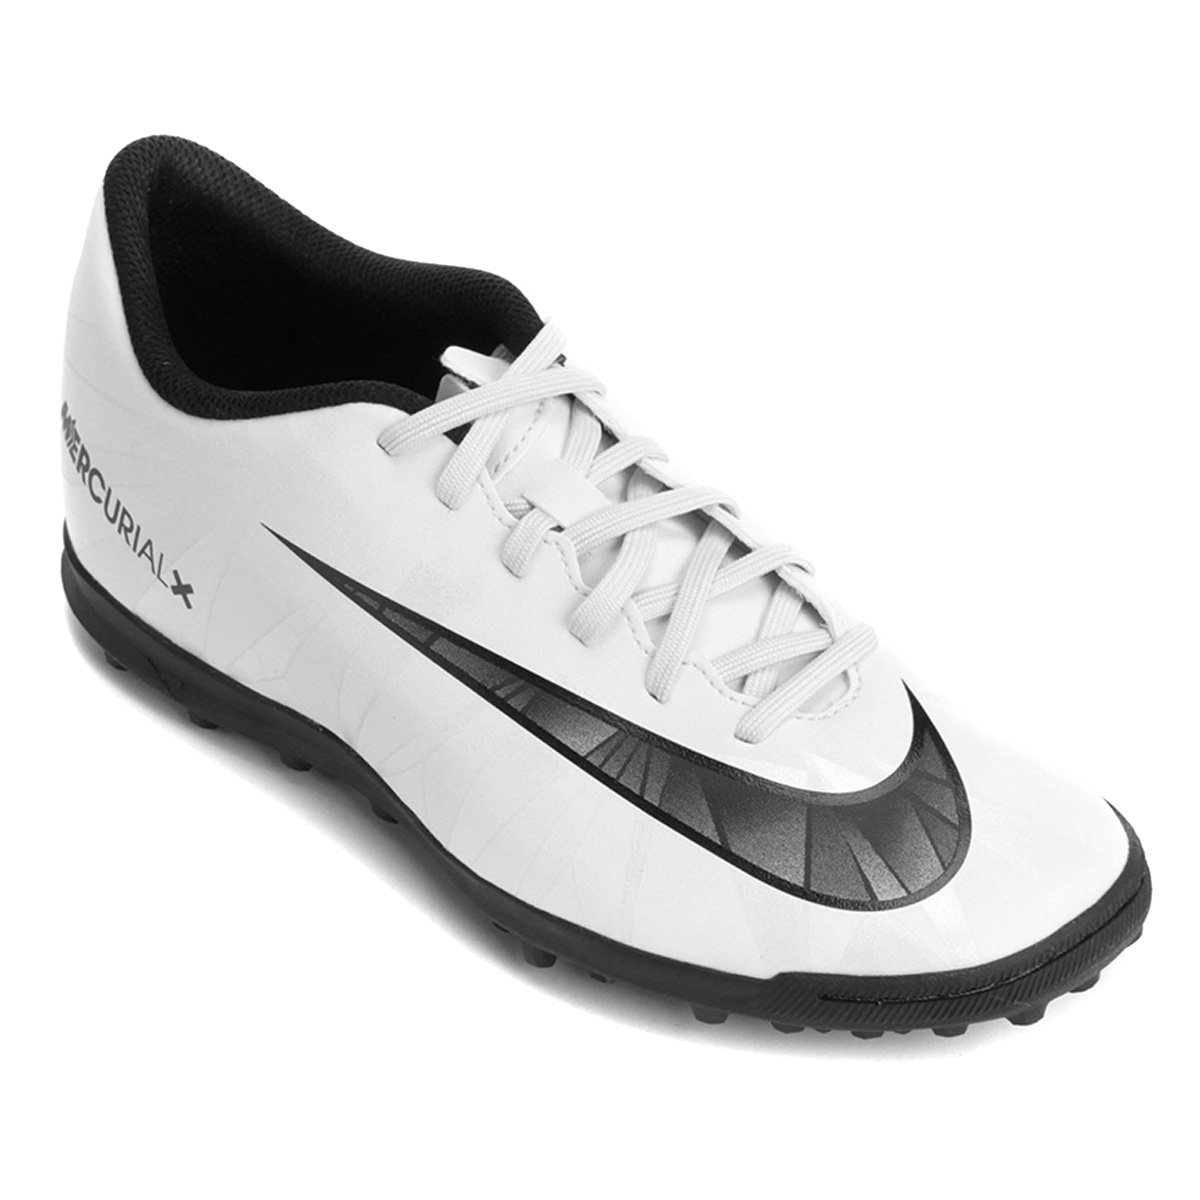 e230e9e05c Chuteira Society Nike Mercurial X Vortex 3 CR7 TF - Compre Agora ...